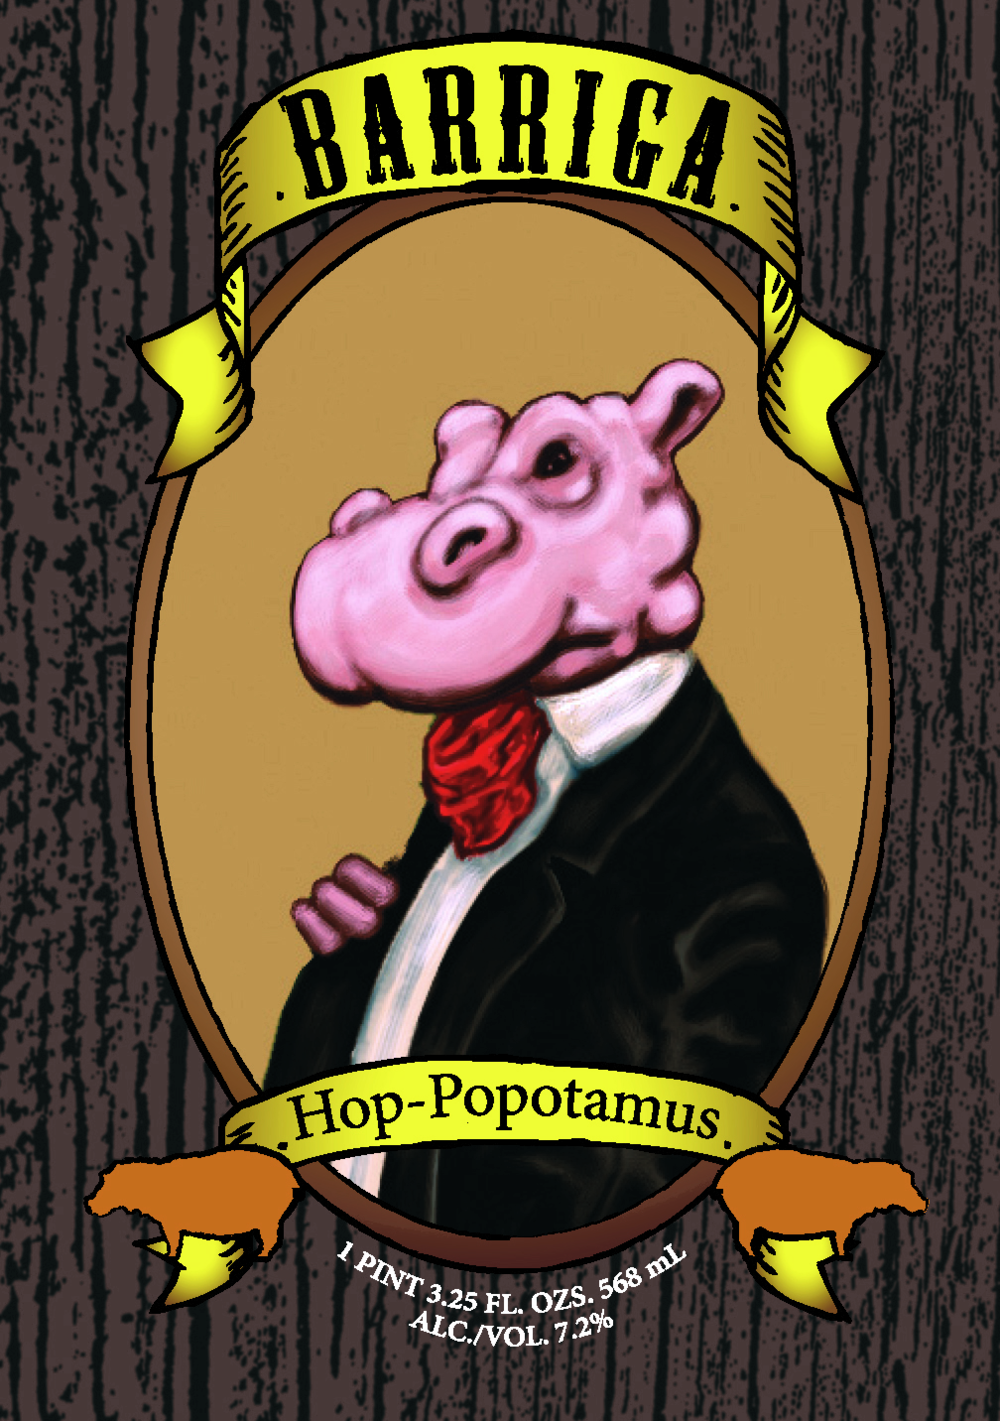 Hop-Popotamus label